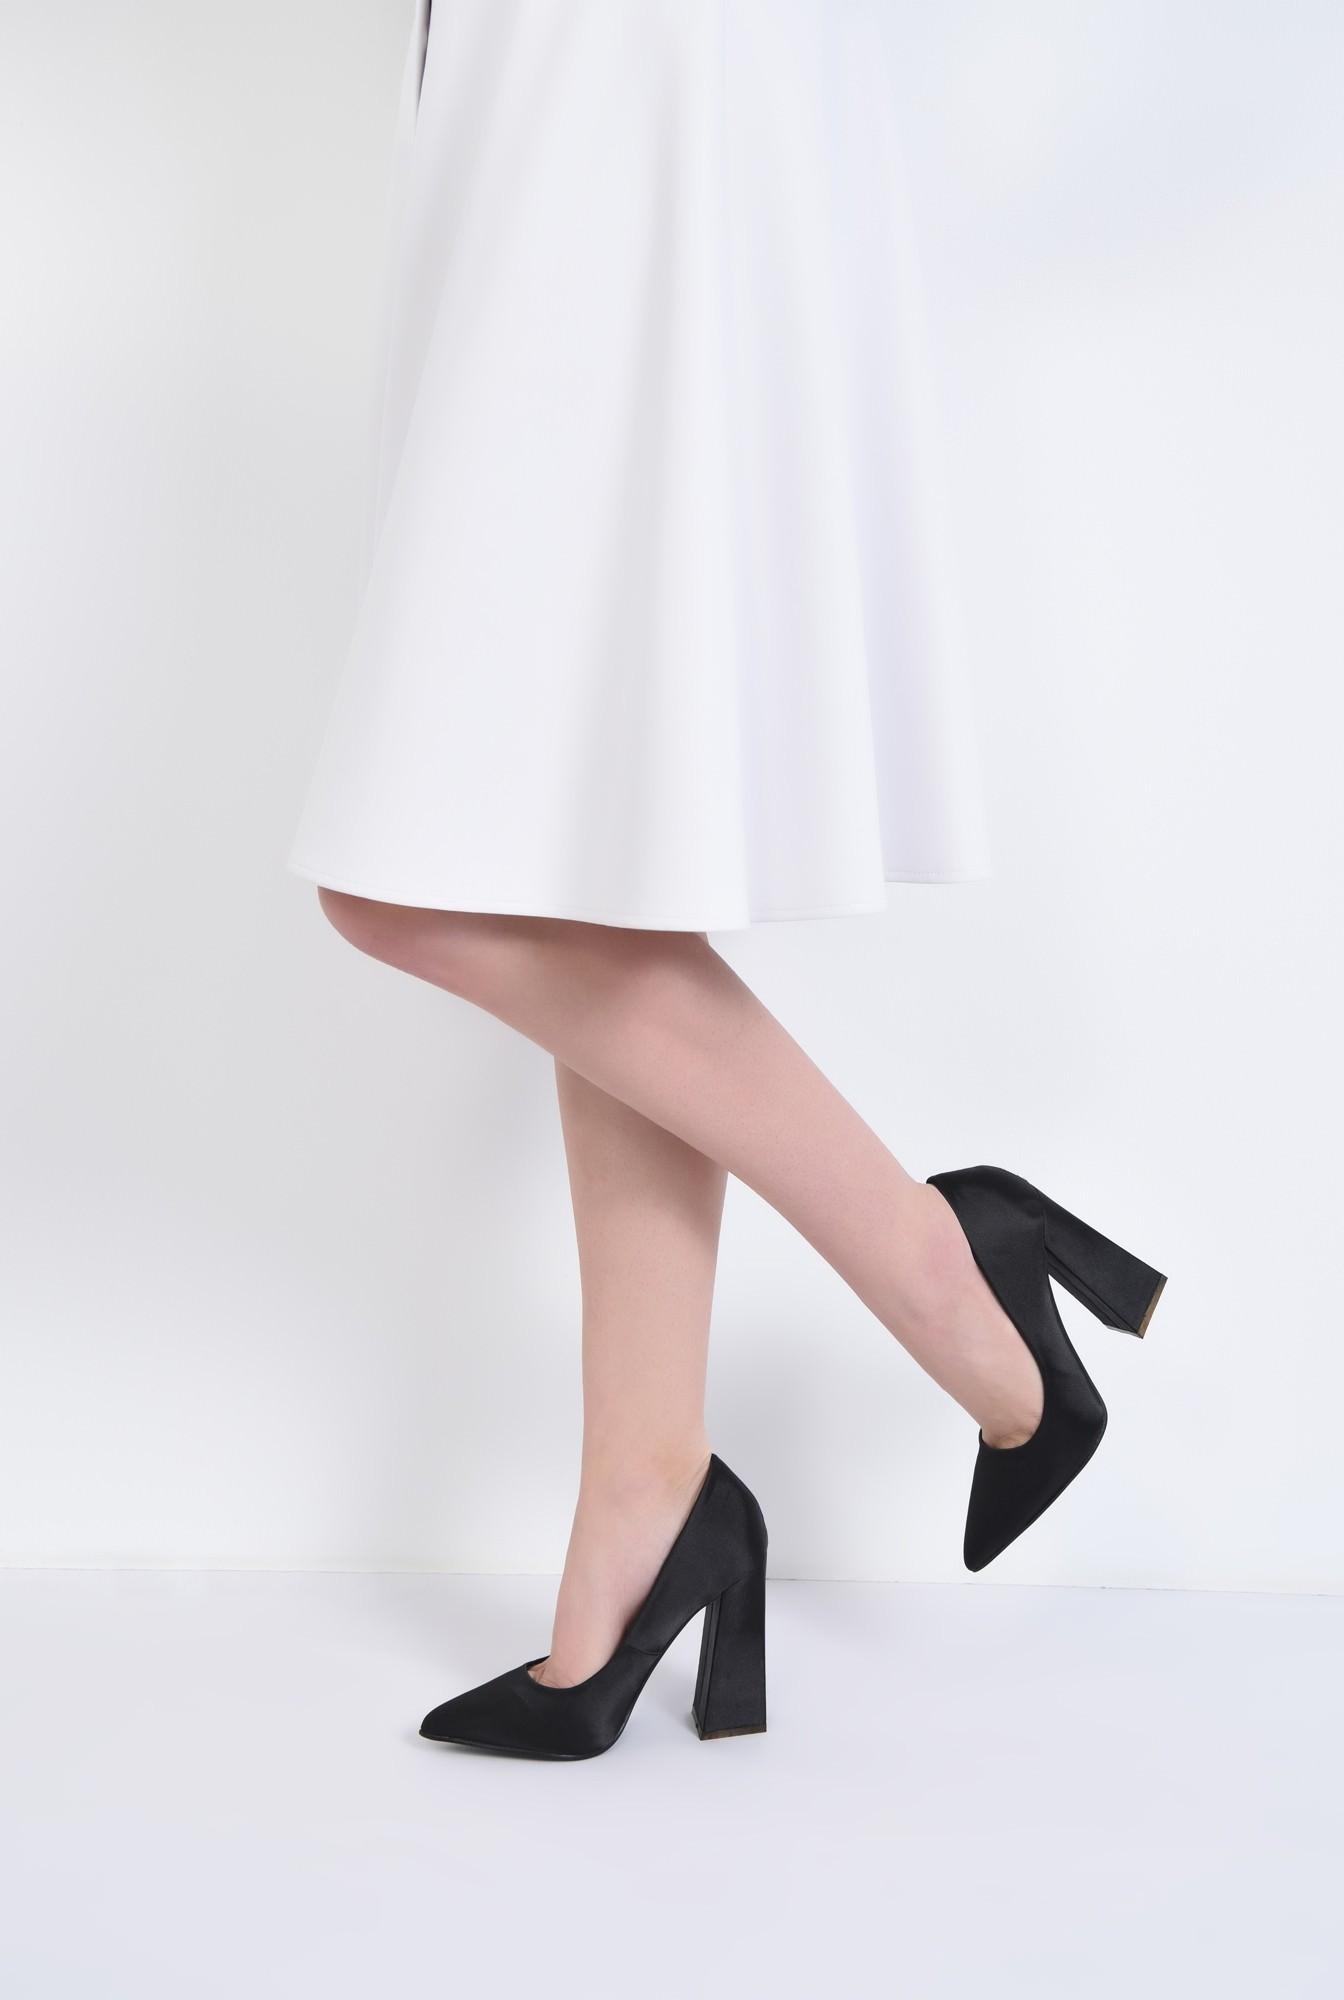 4 - pantofi eleganti, negri, satin, toc inalt